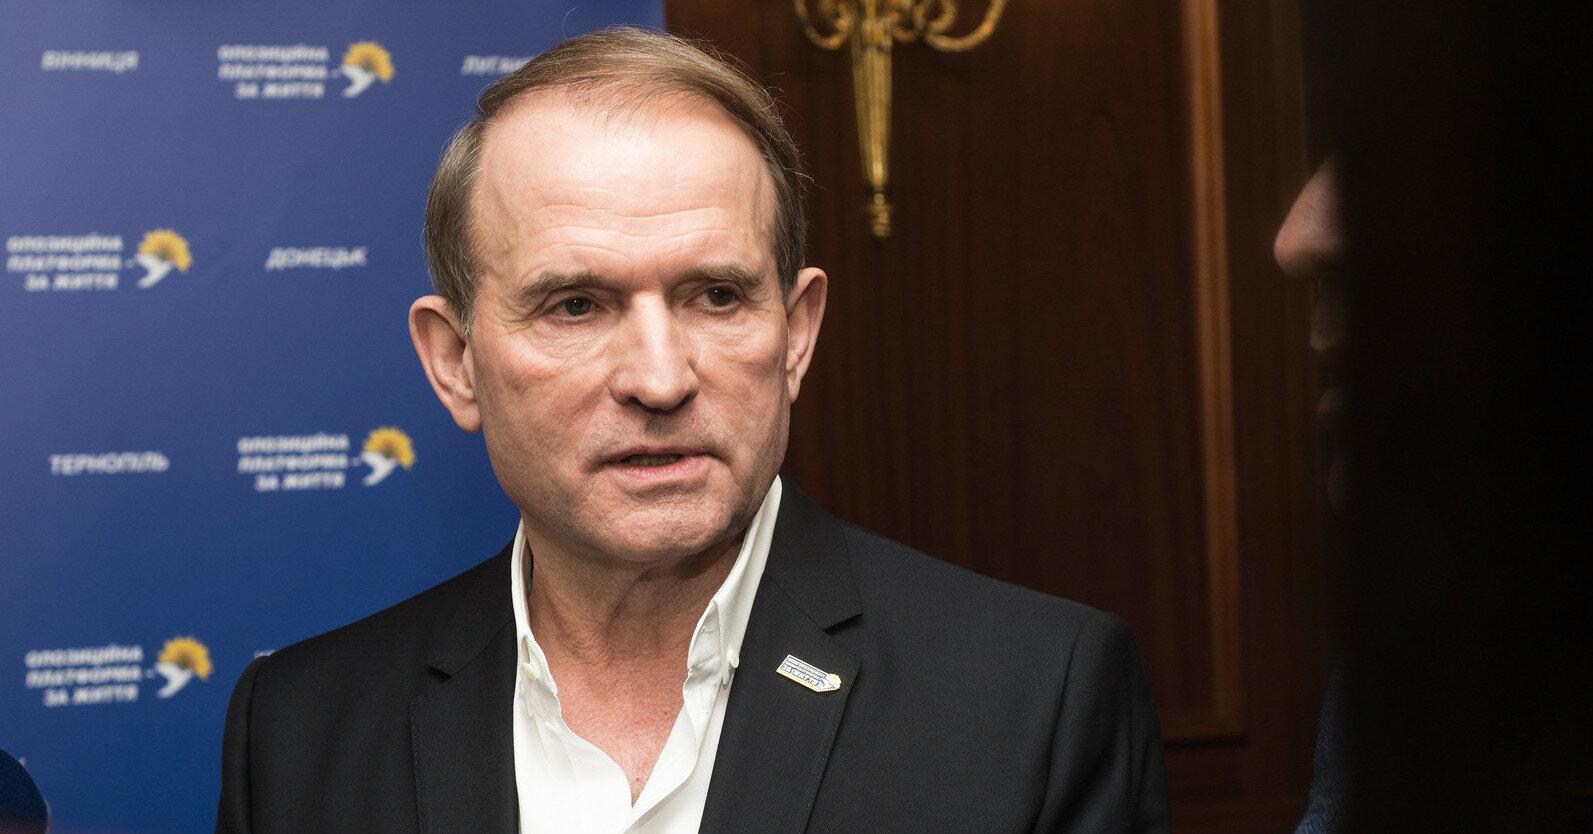 Выход Медведчука из ТКГ остановил минский процесс